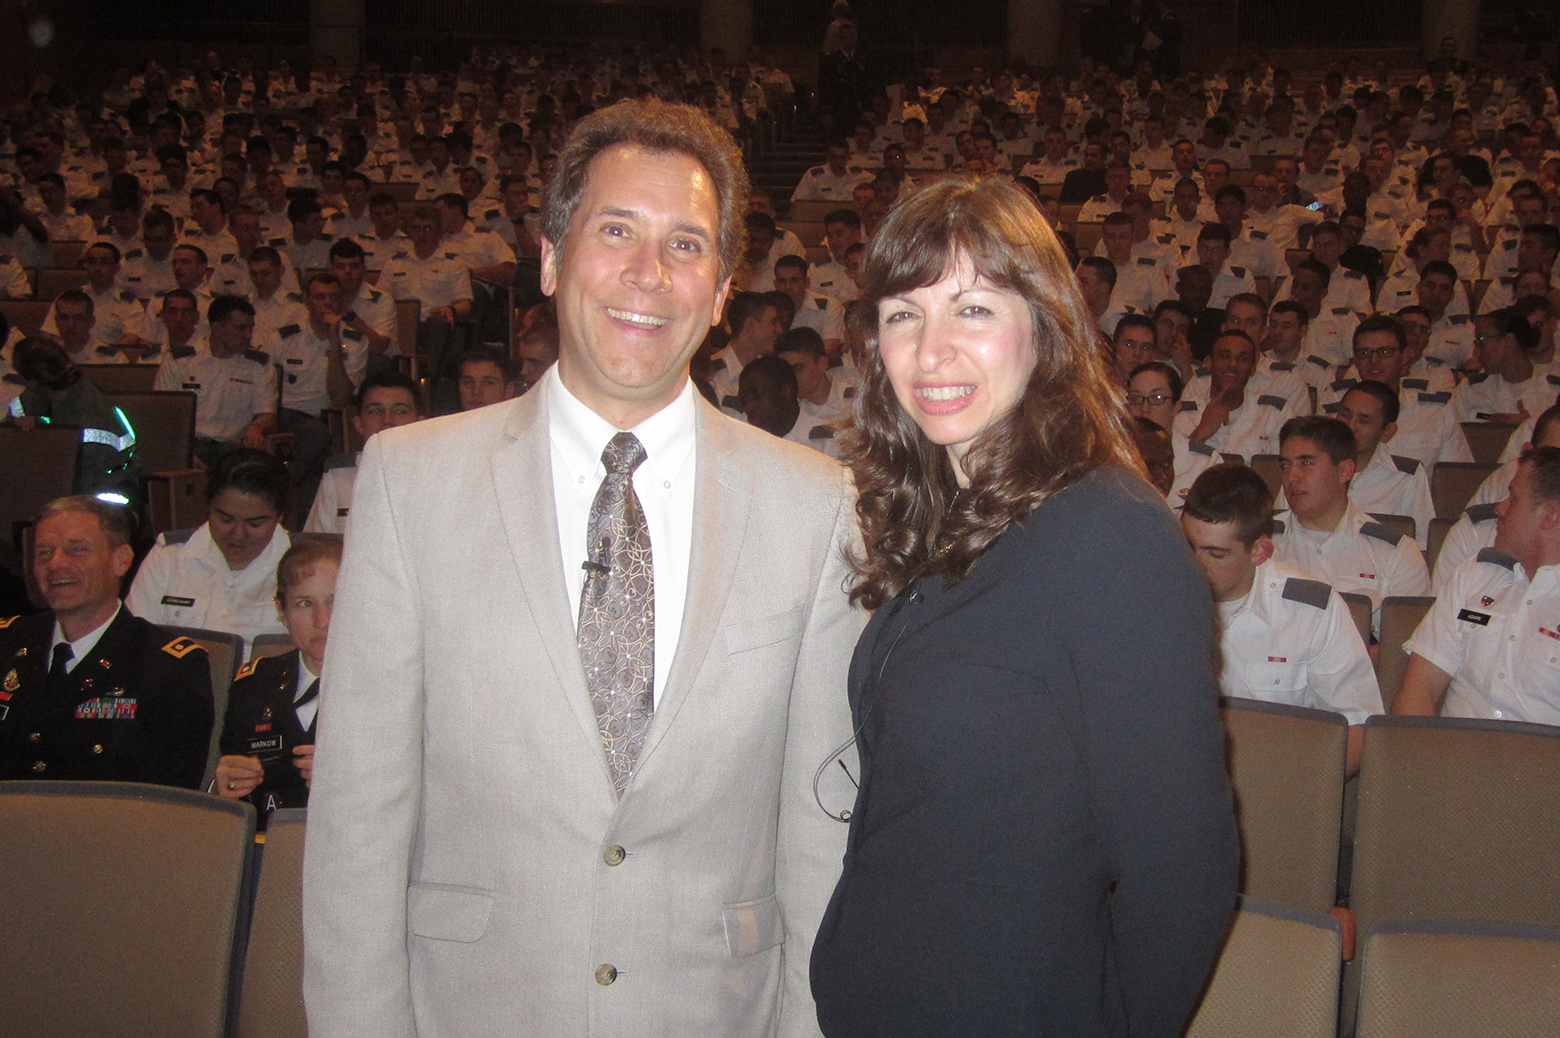 Mark Guzdial and Barbara Ericson